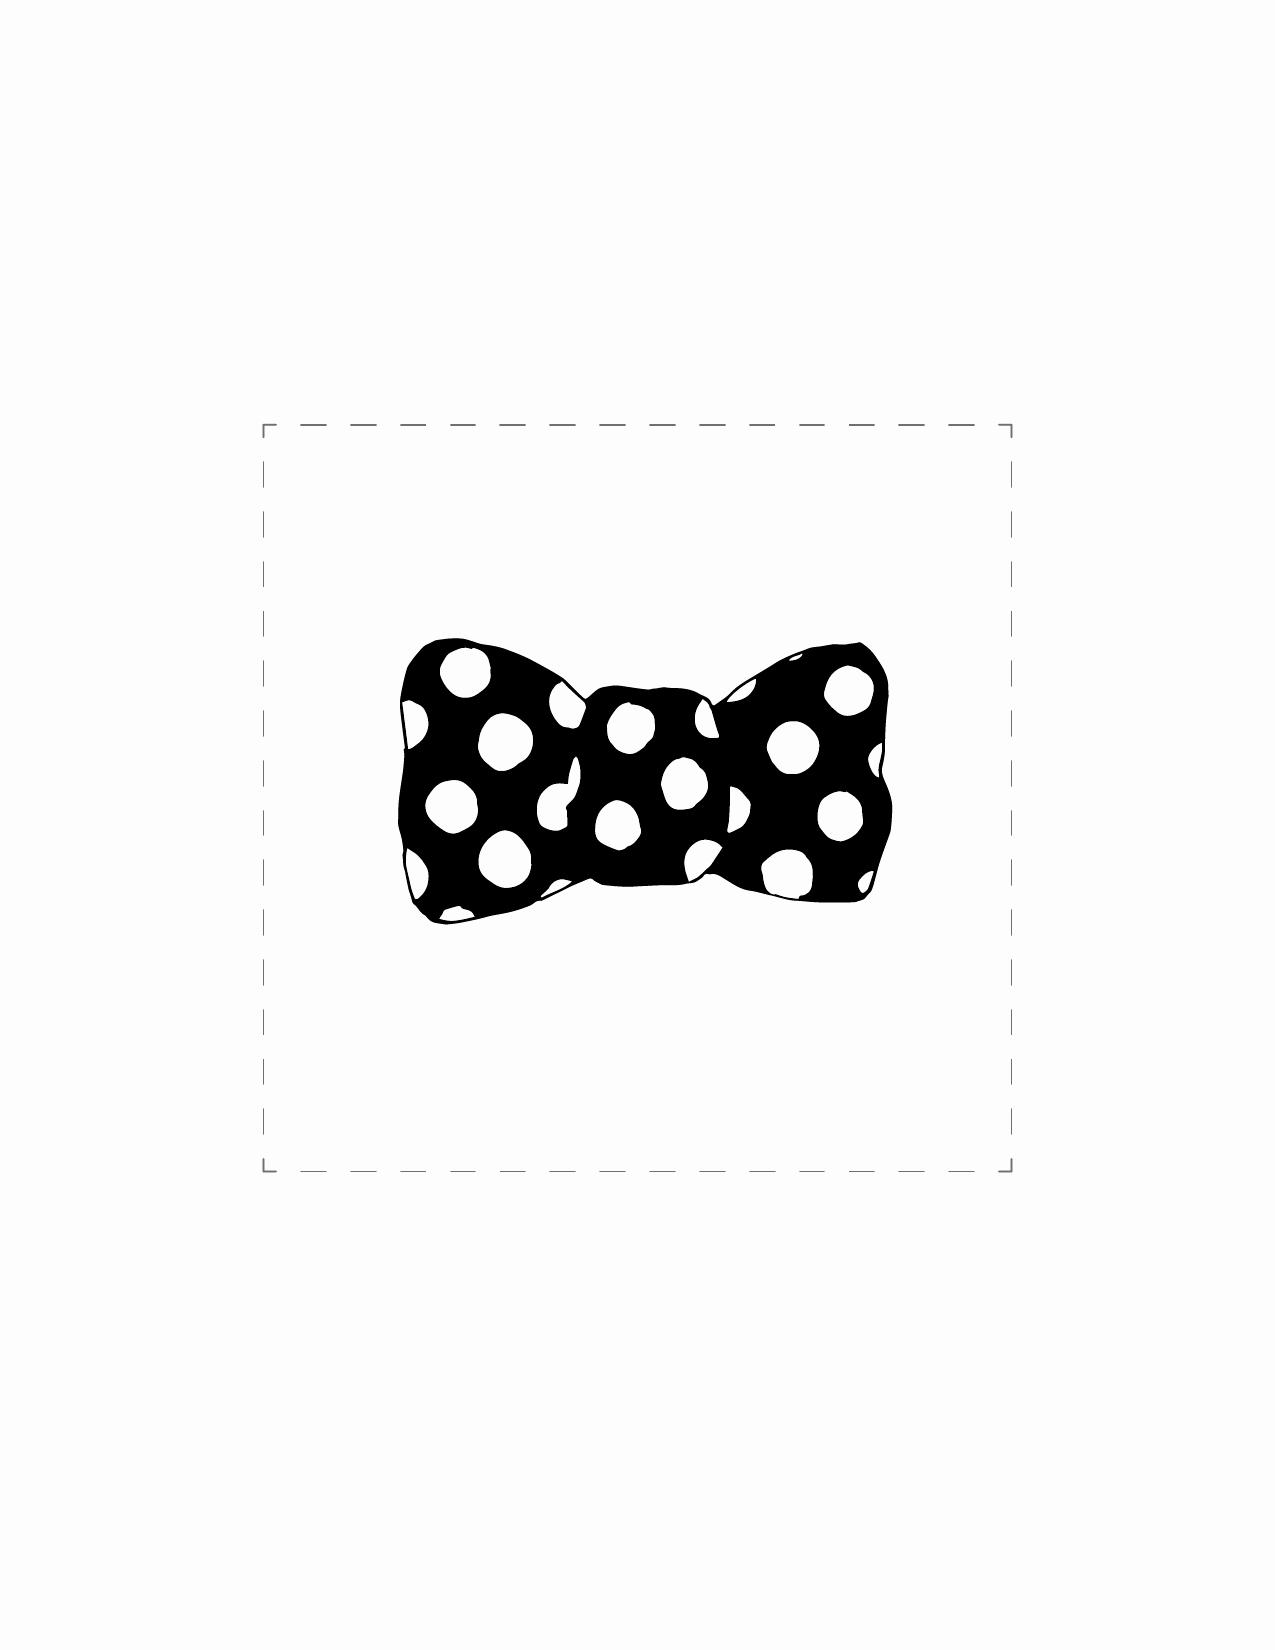 Polka Dot Template for Word Beautiful Diy Ceramic Coasters